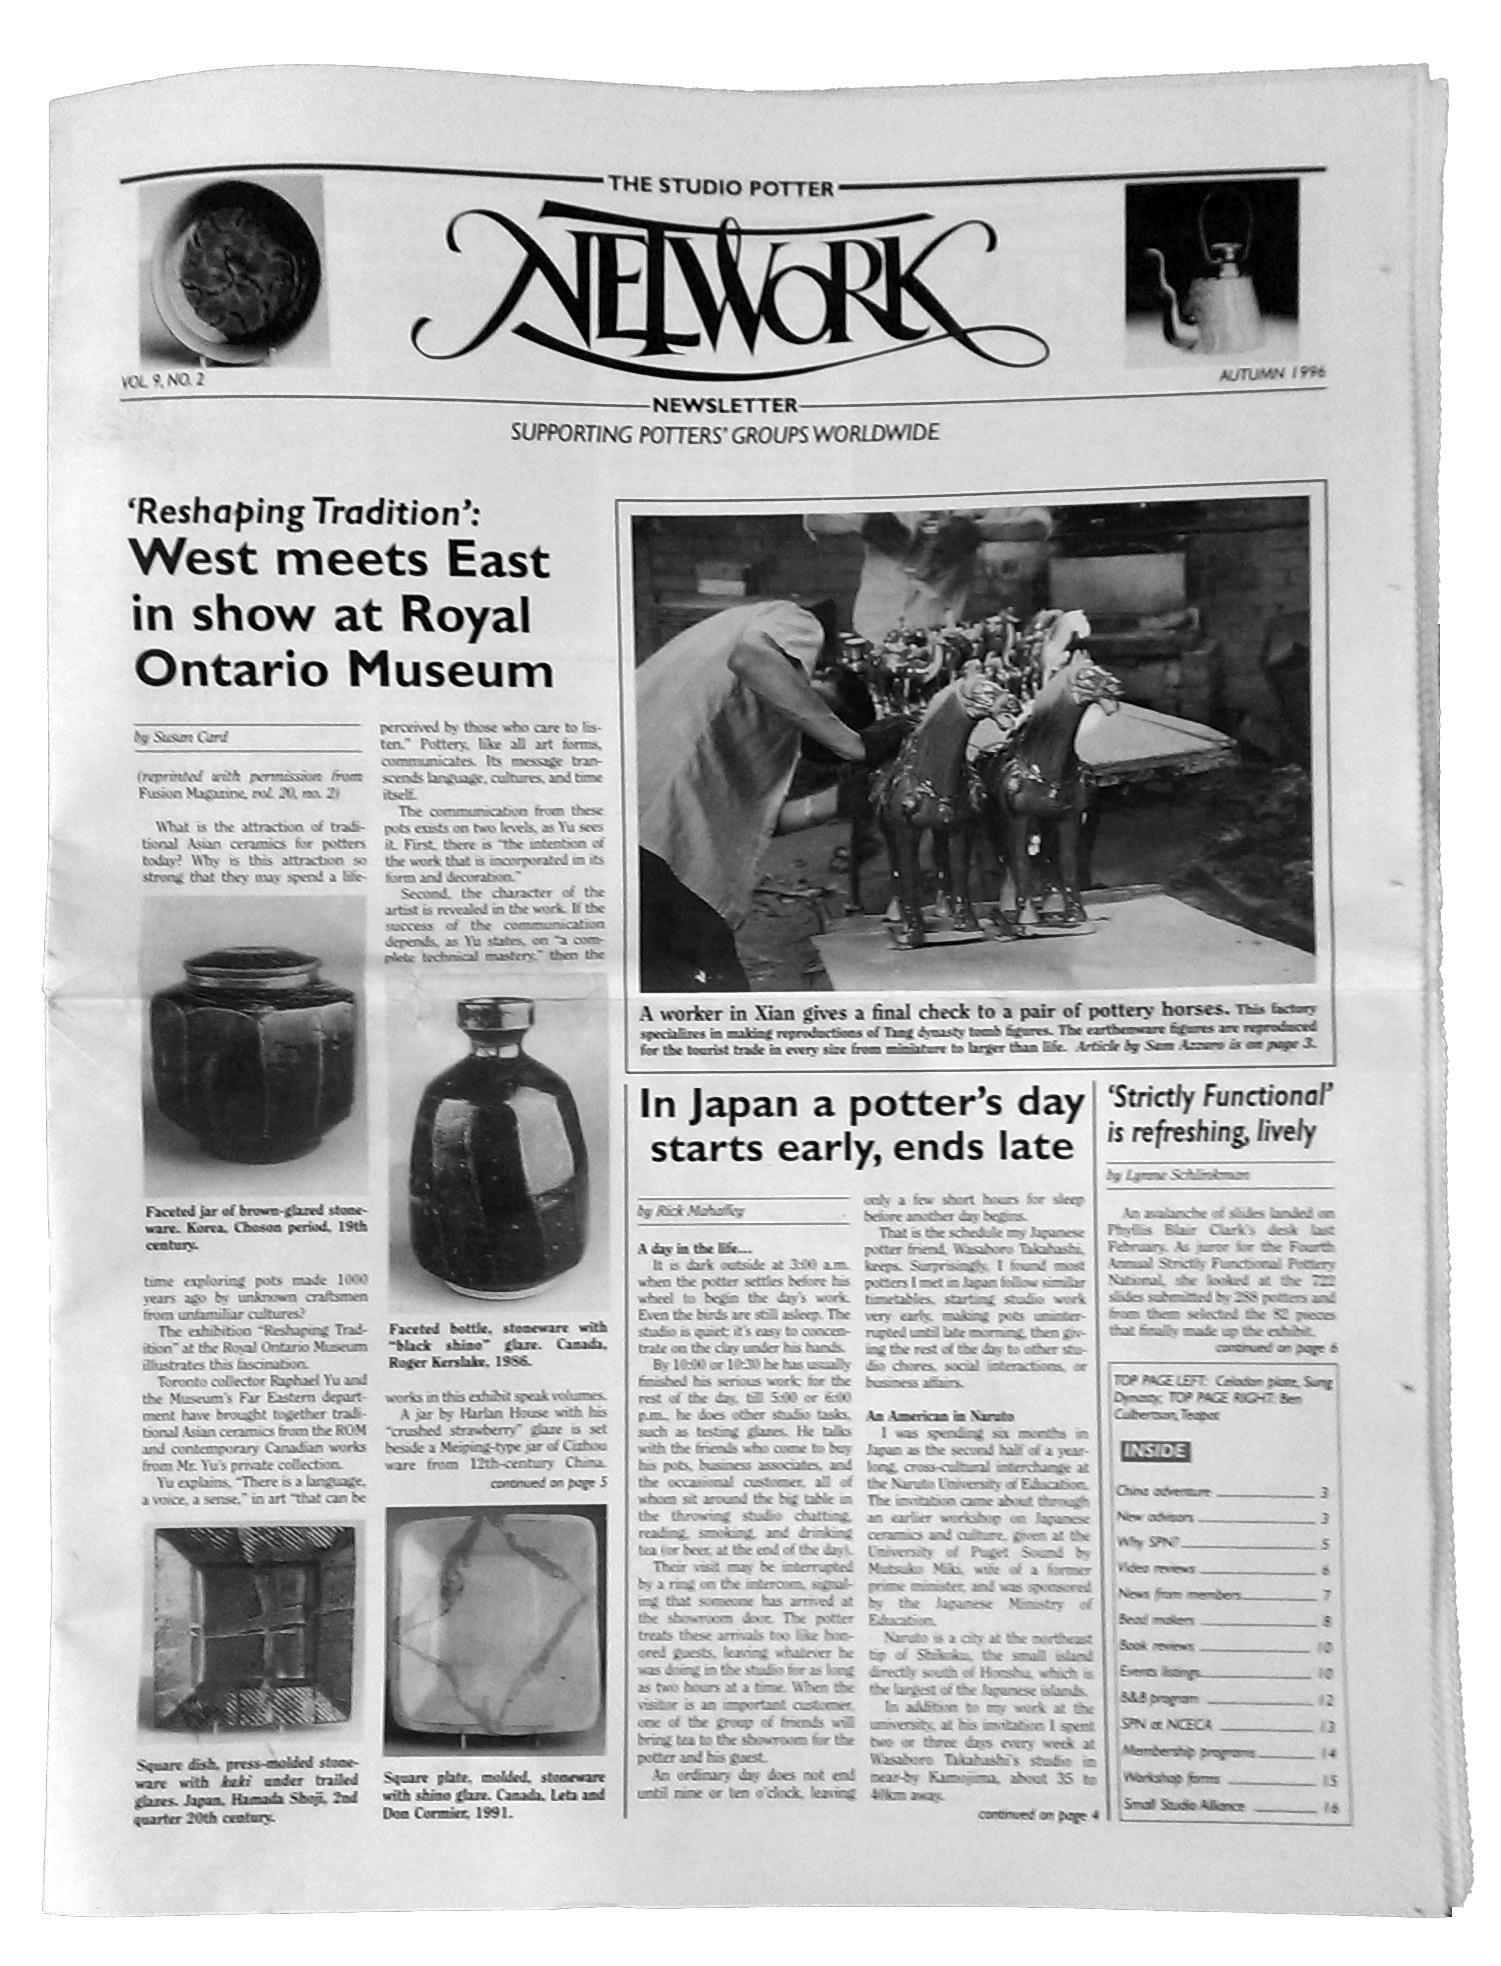 Studio Potter Network Newsletter, Vol. 9 No. 2, 1996.